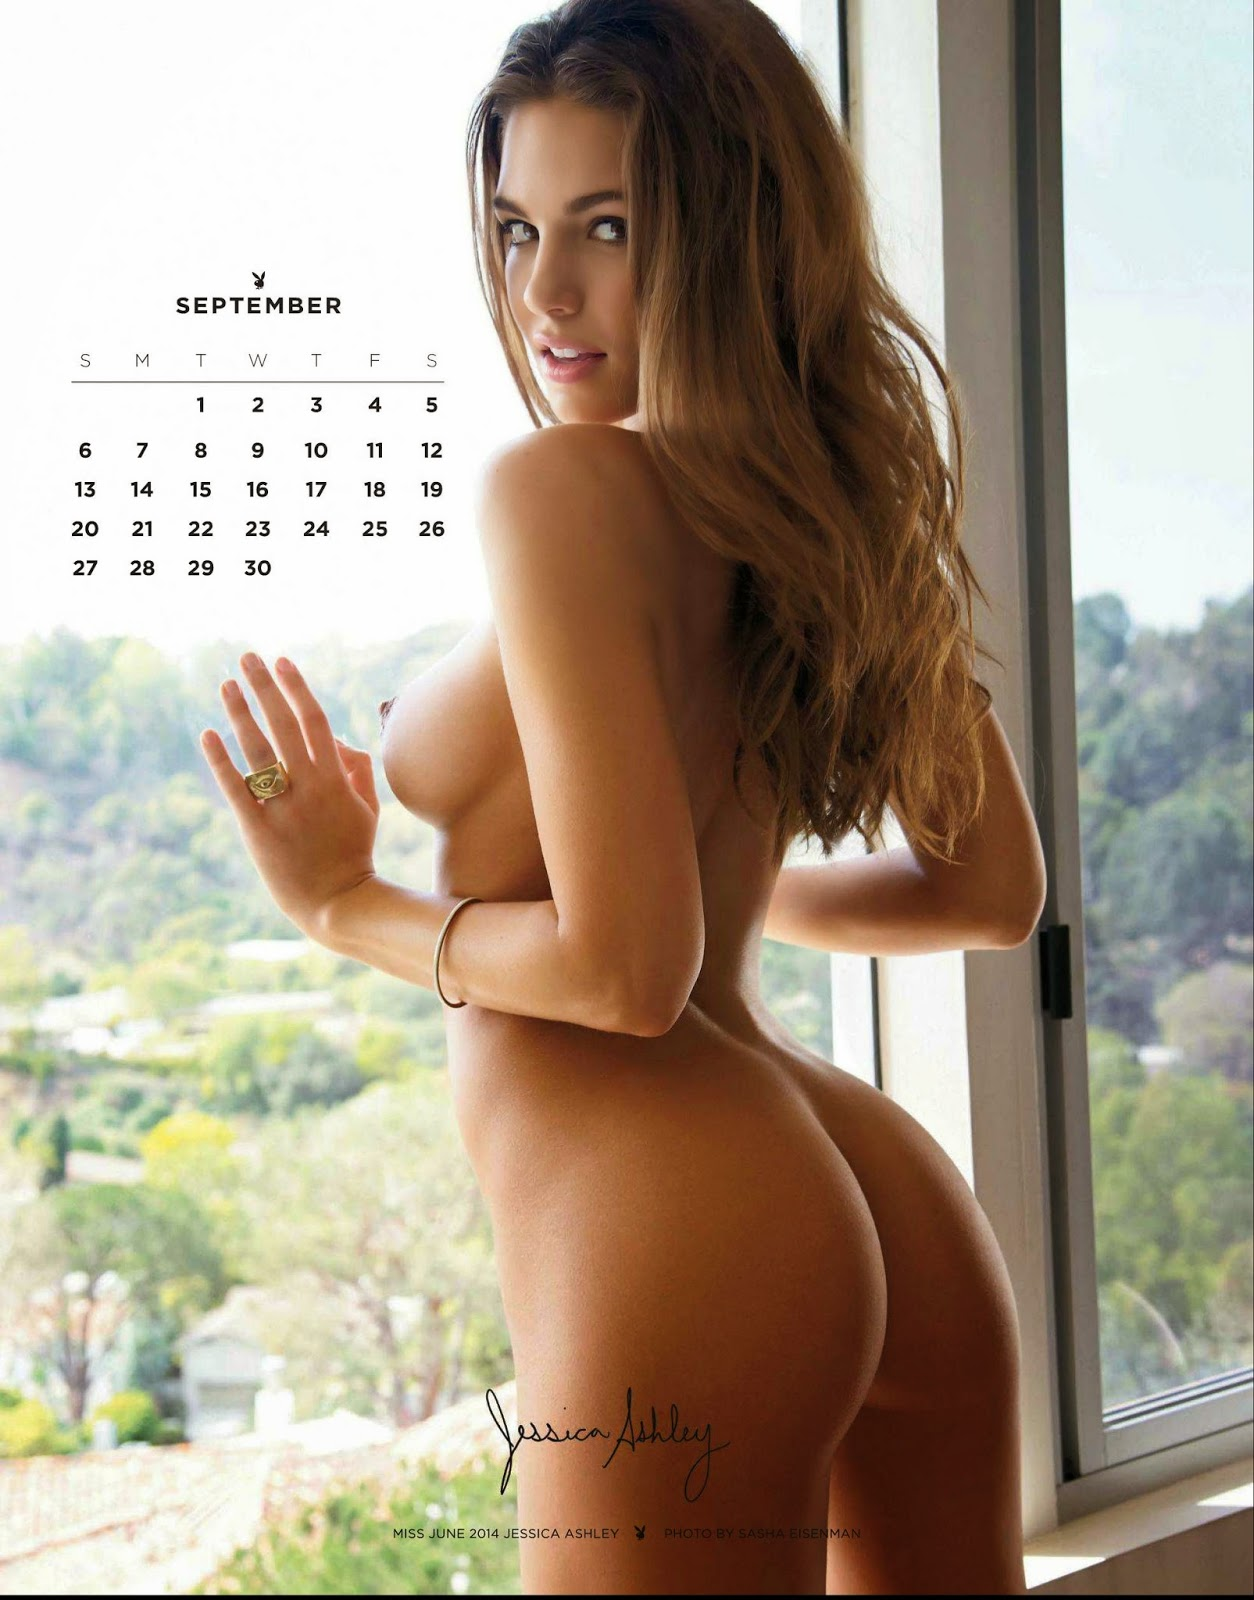 Playboy Babes - hot metxxx.pw pics, playboy playmates and models!